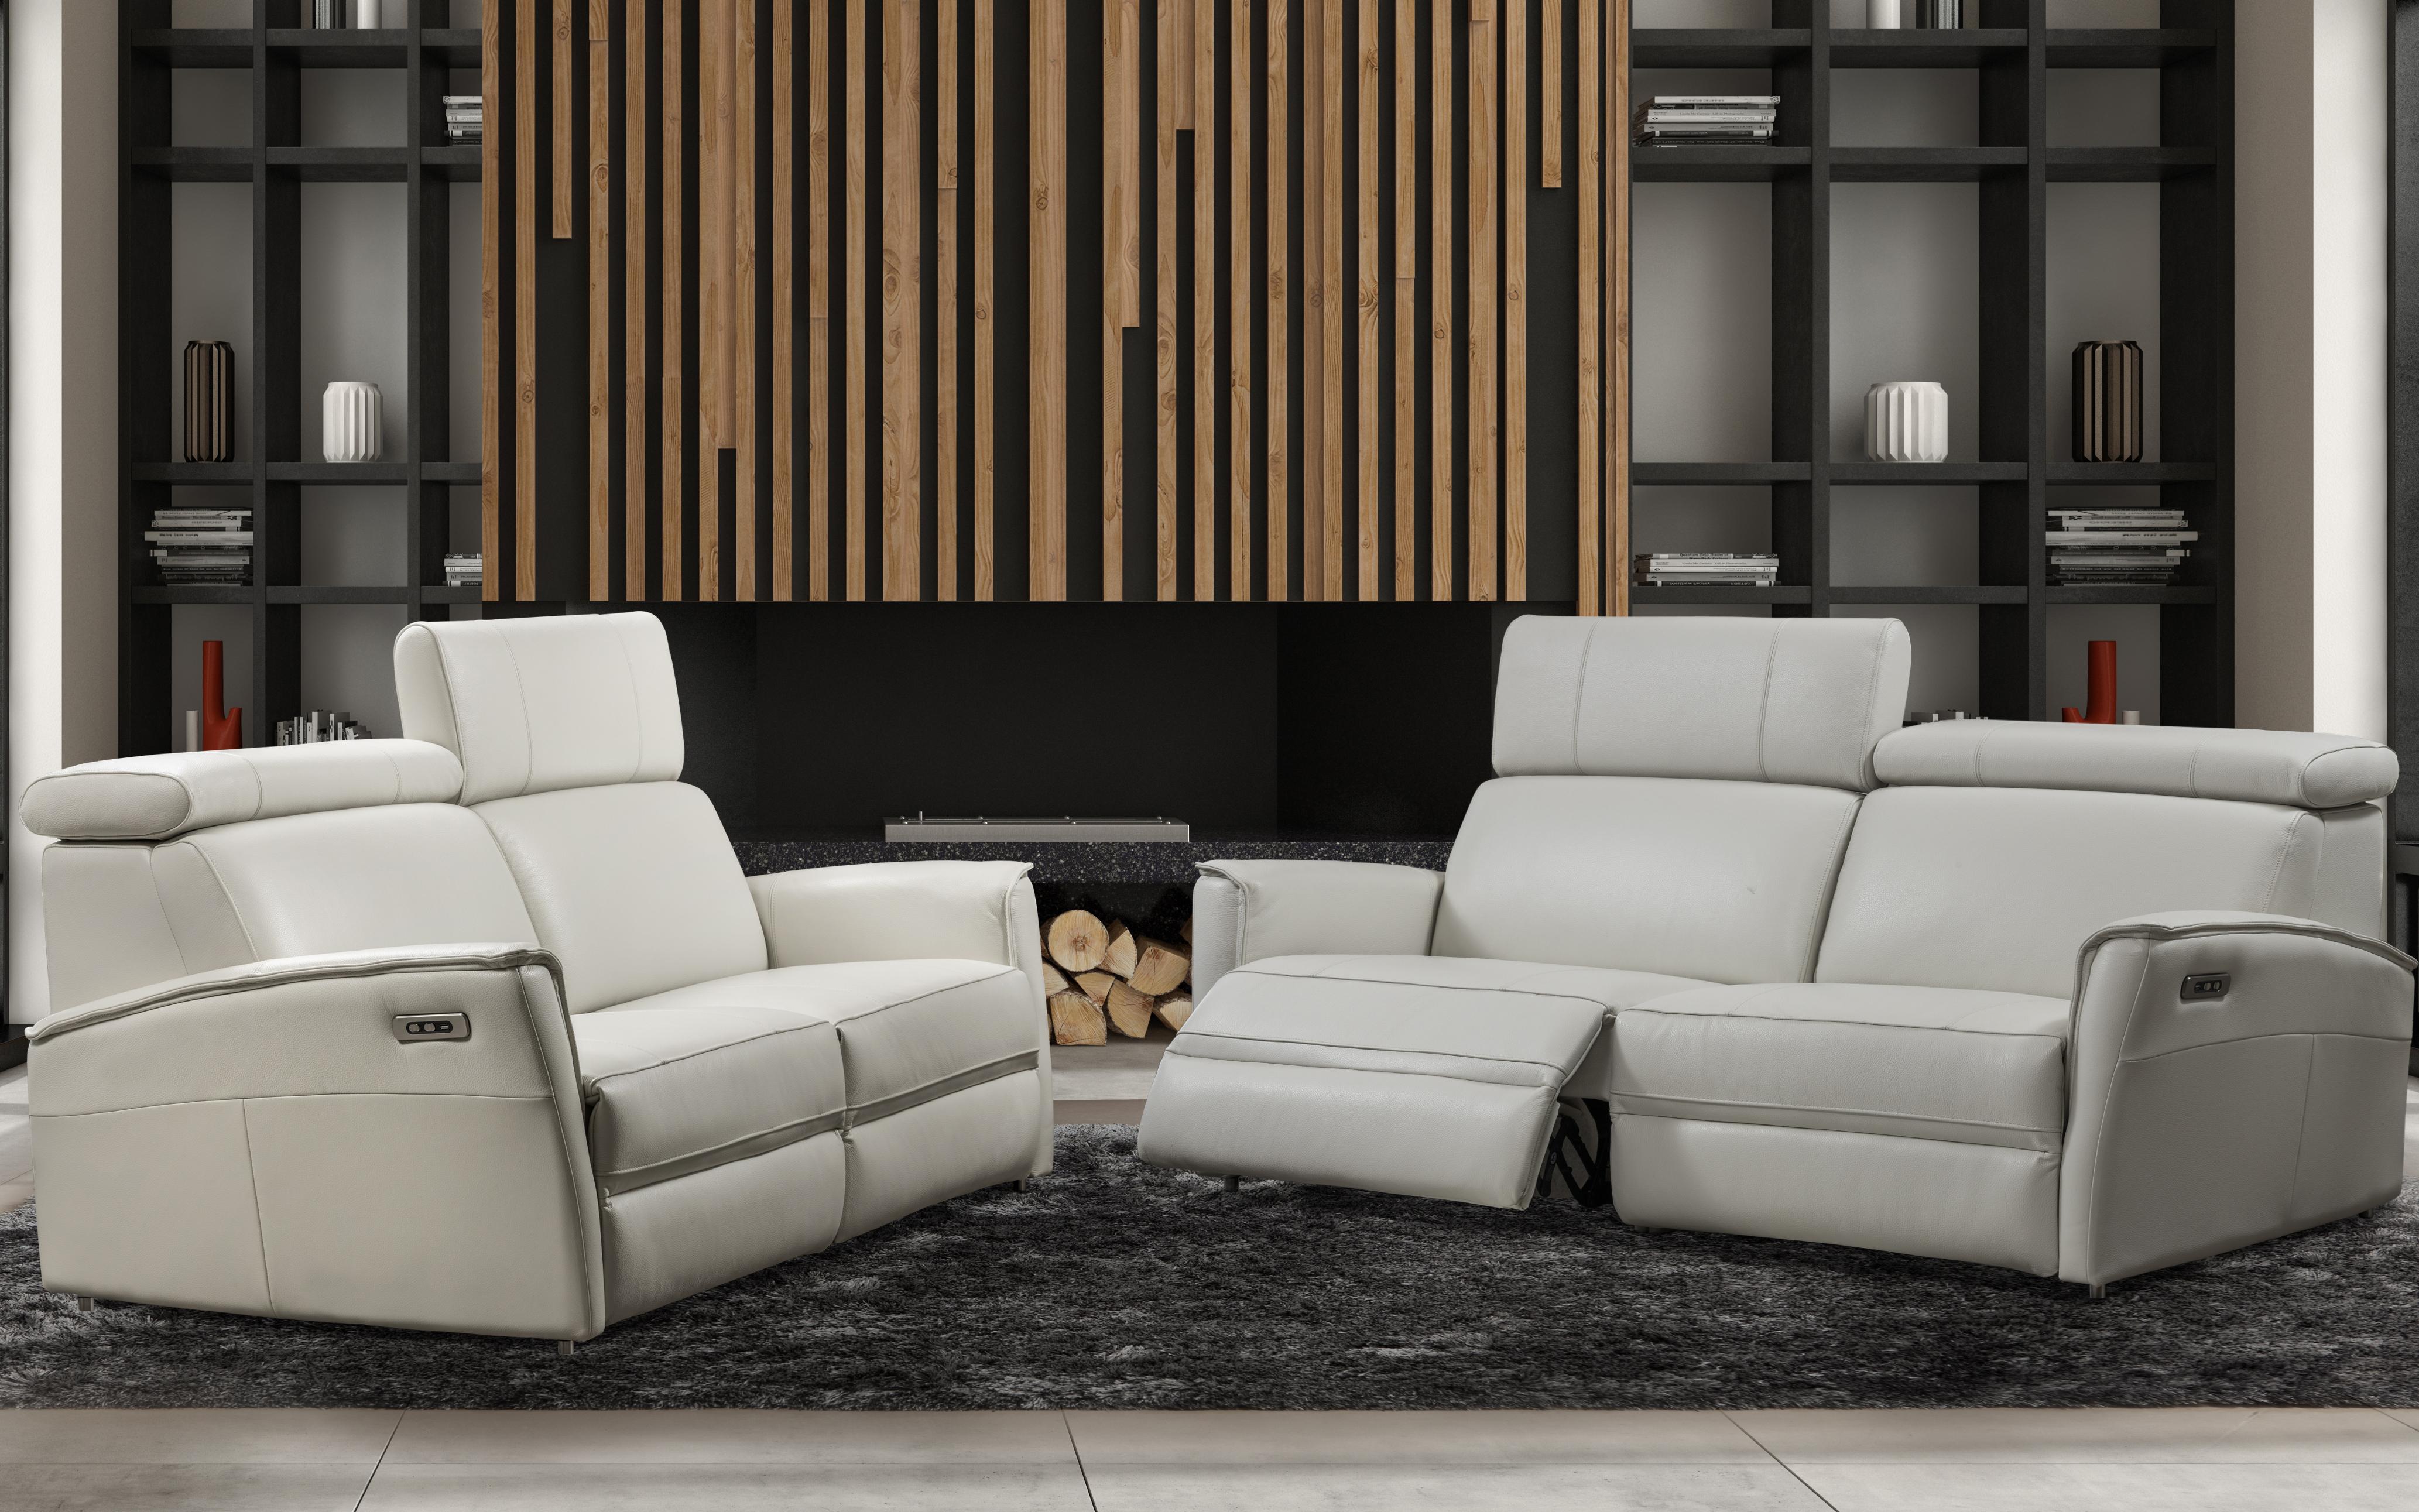 fine italian leather furniture. via furniture genuine italian leather and upholstered furniture fine r